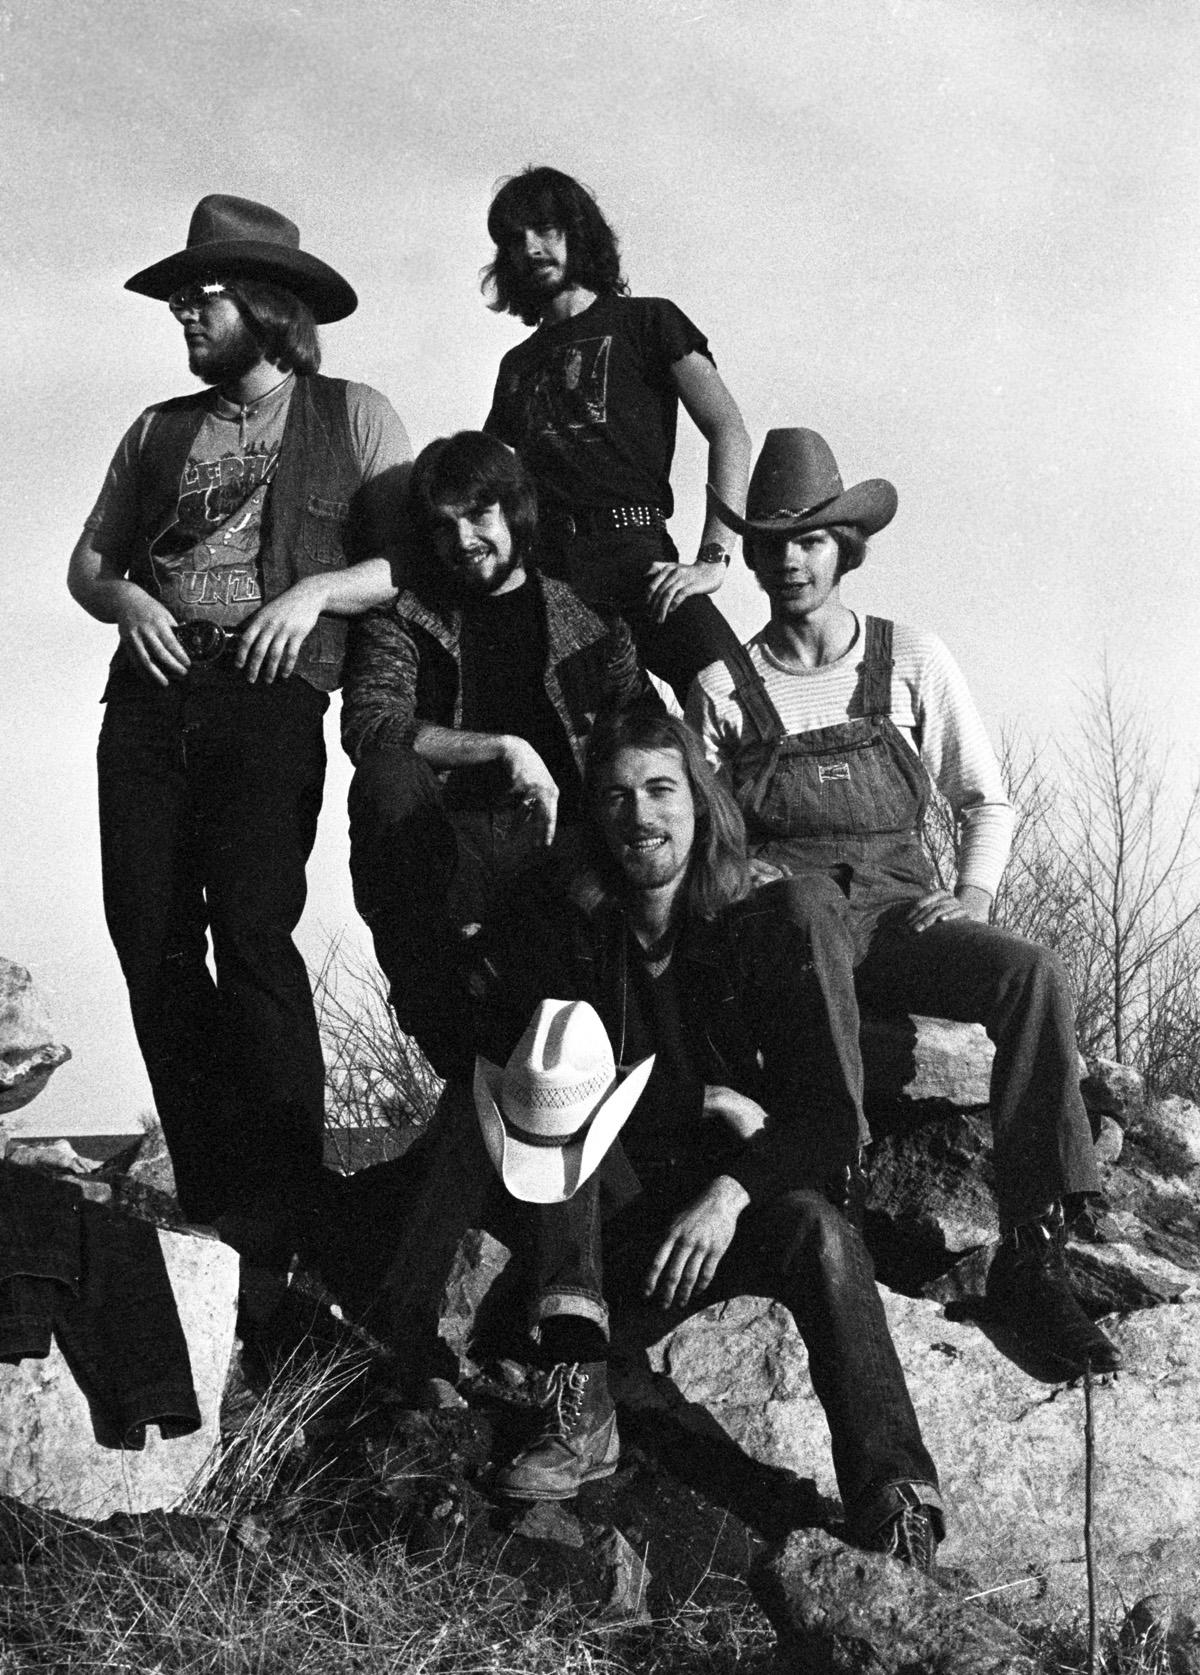 The Amazing Jackalopes circa 1977 (l-r): Drummer Jack Propps, Bassist Jeff Donachy,  Keyboardist Brian Wilson, Guitarist Jeff Hett and Guitarist Jack Clift.